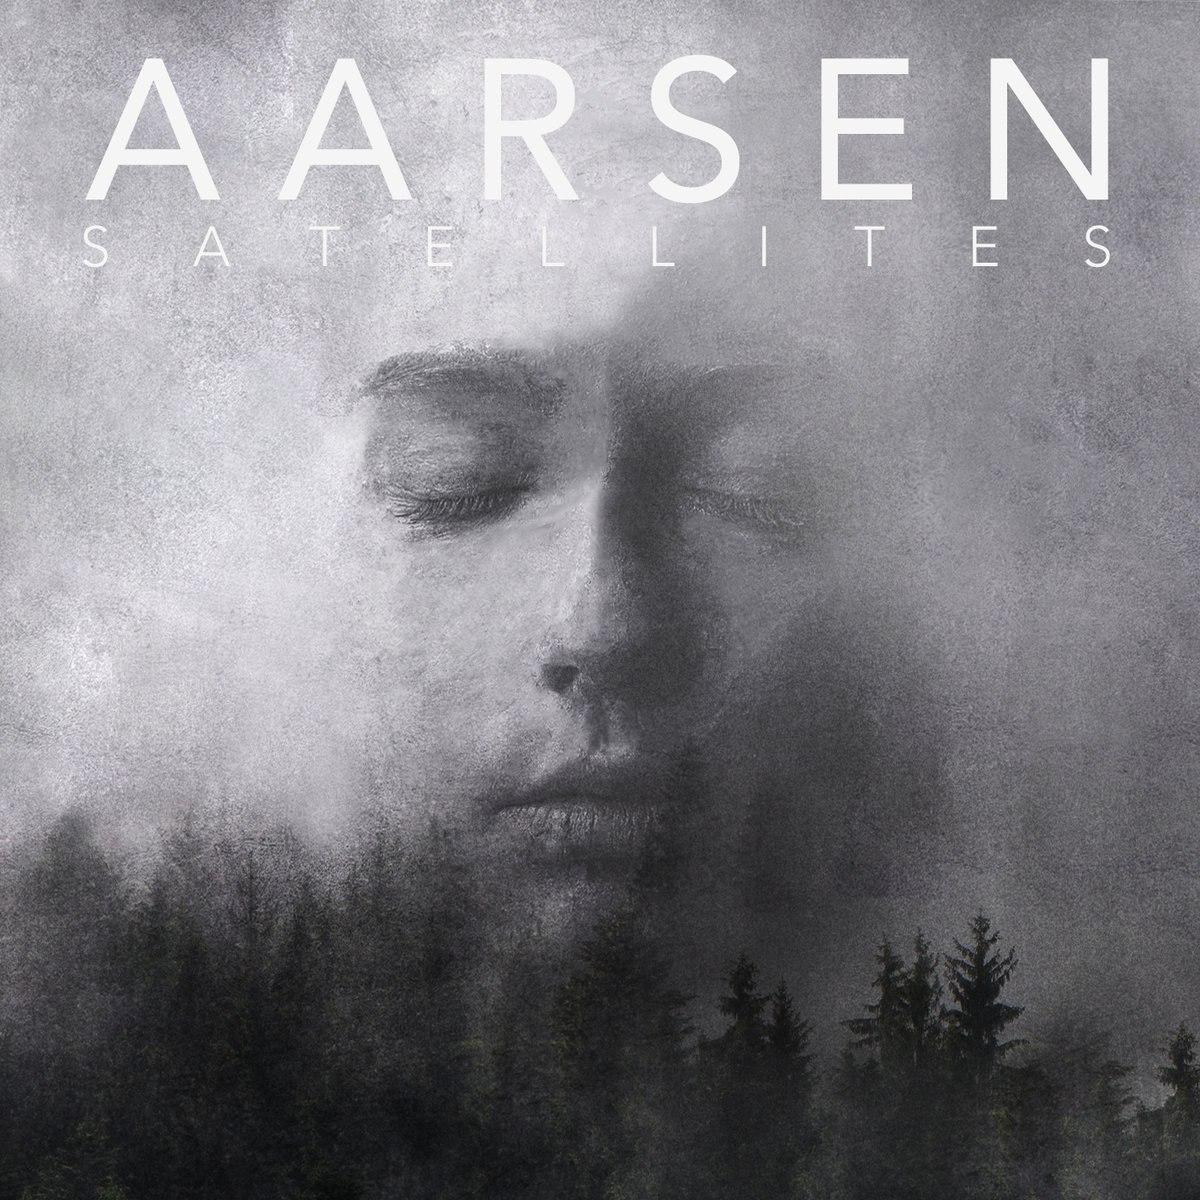 Aarsen - Satellites [EP] (2017)